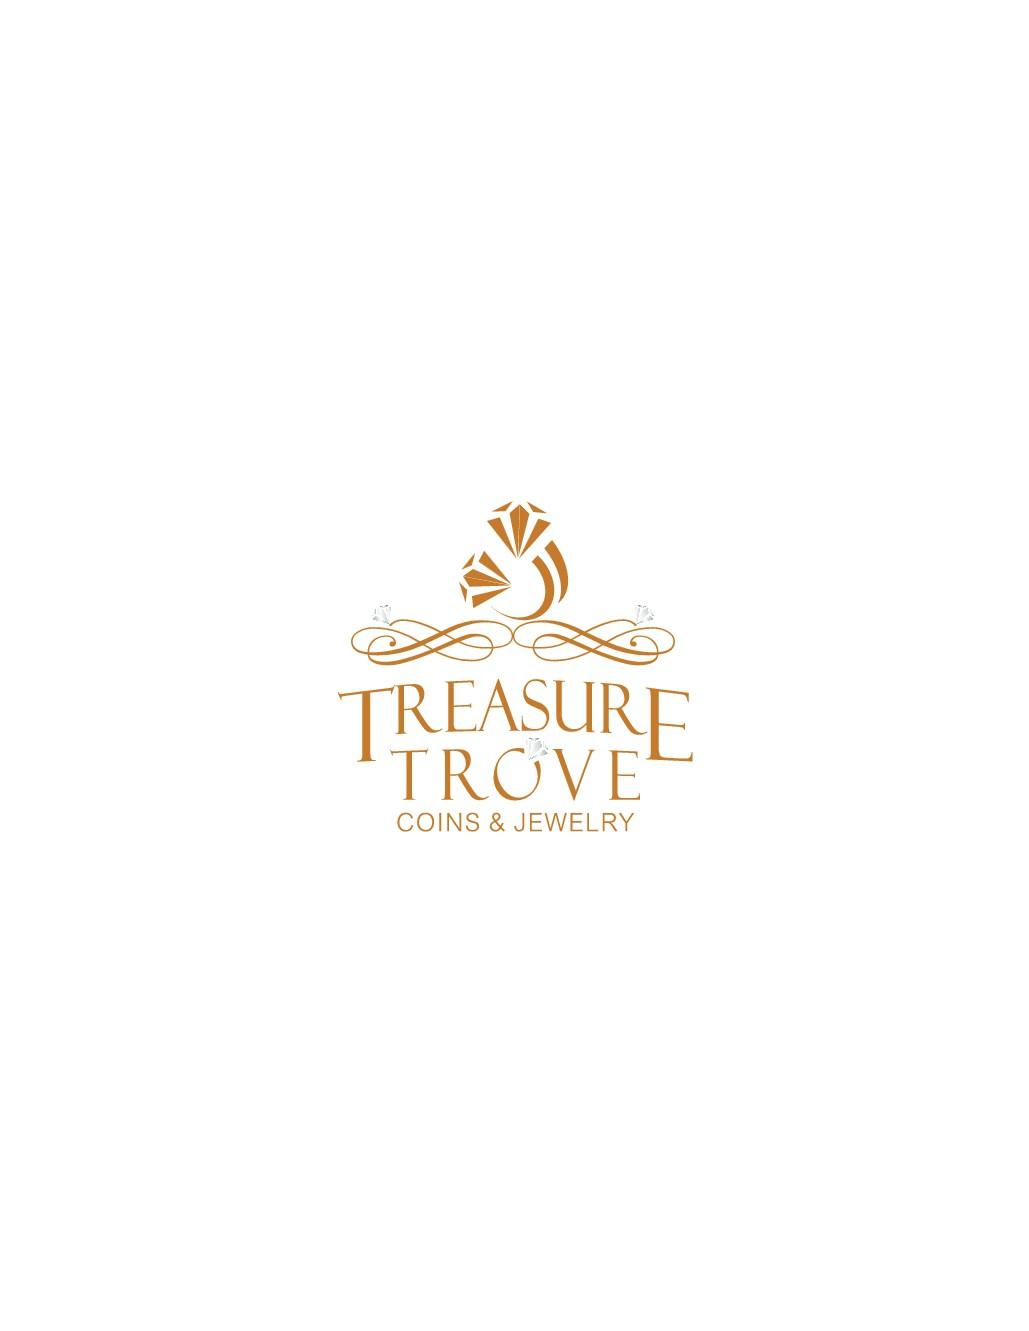 Treasure Trove Coins & Jewelry needs a LOGO